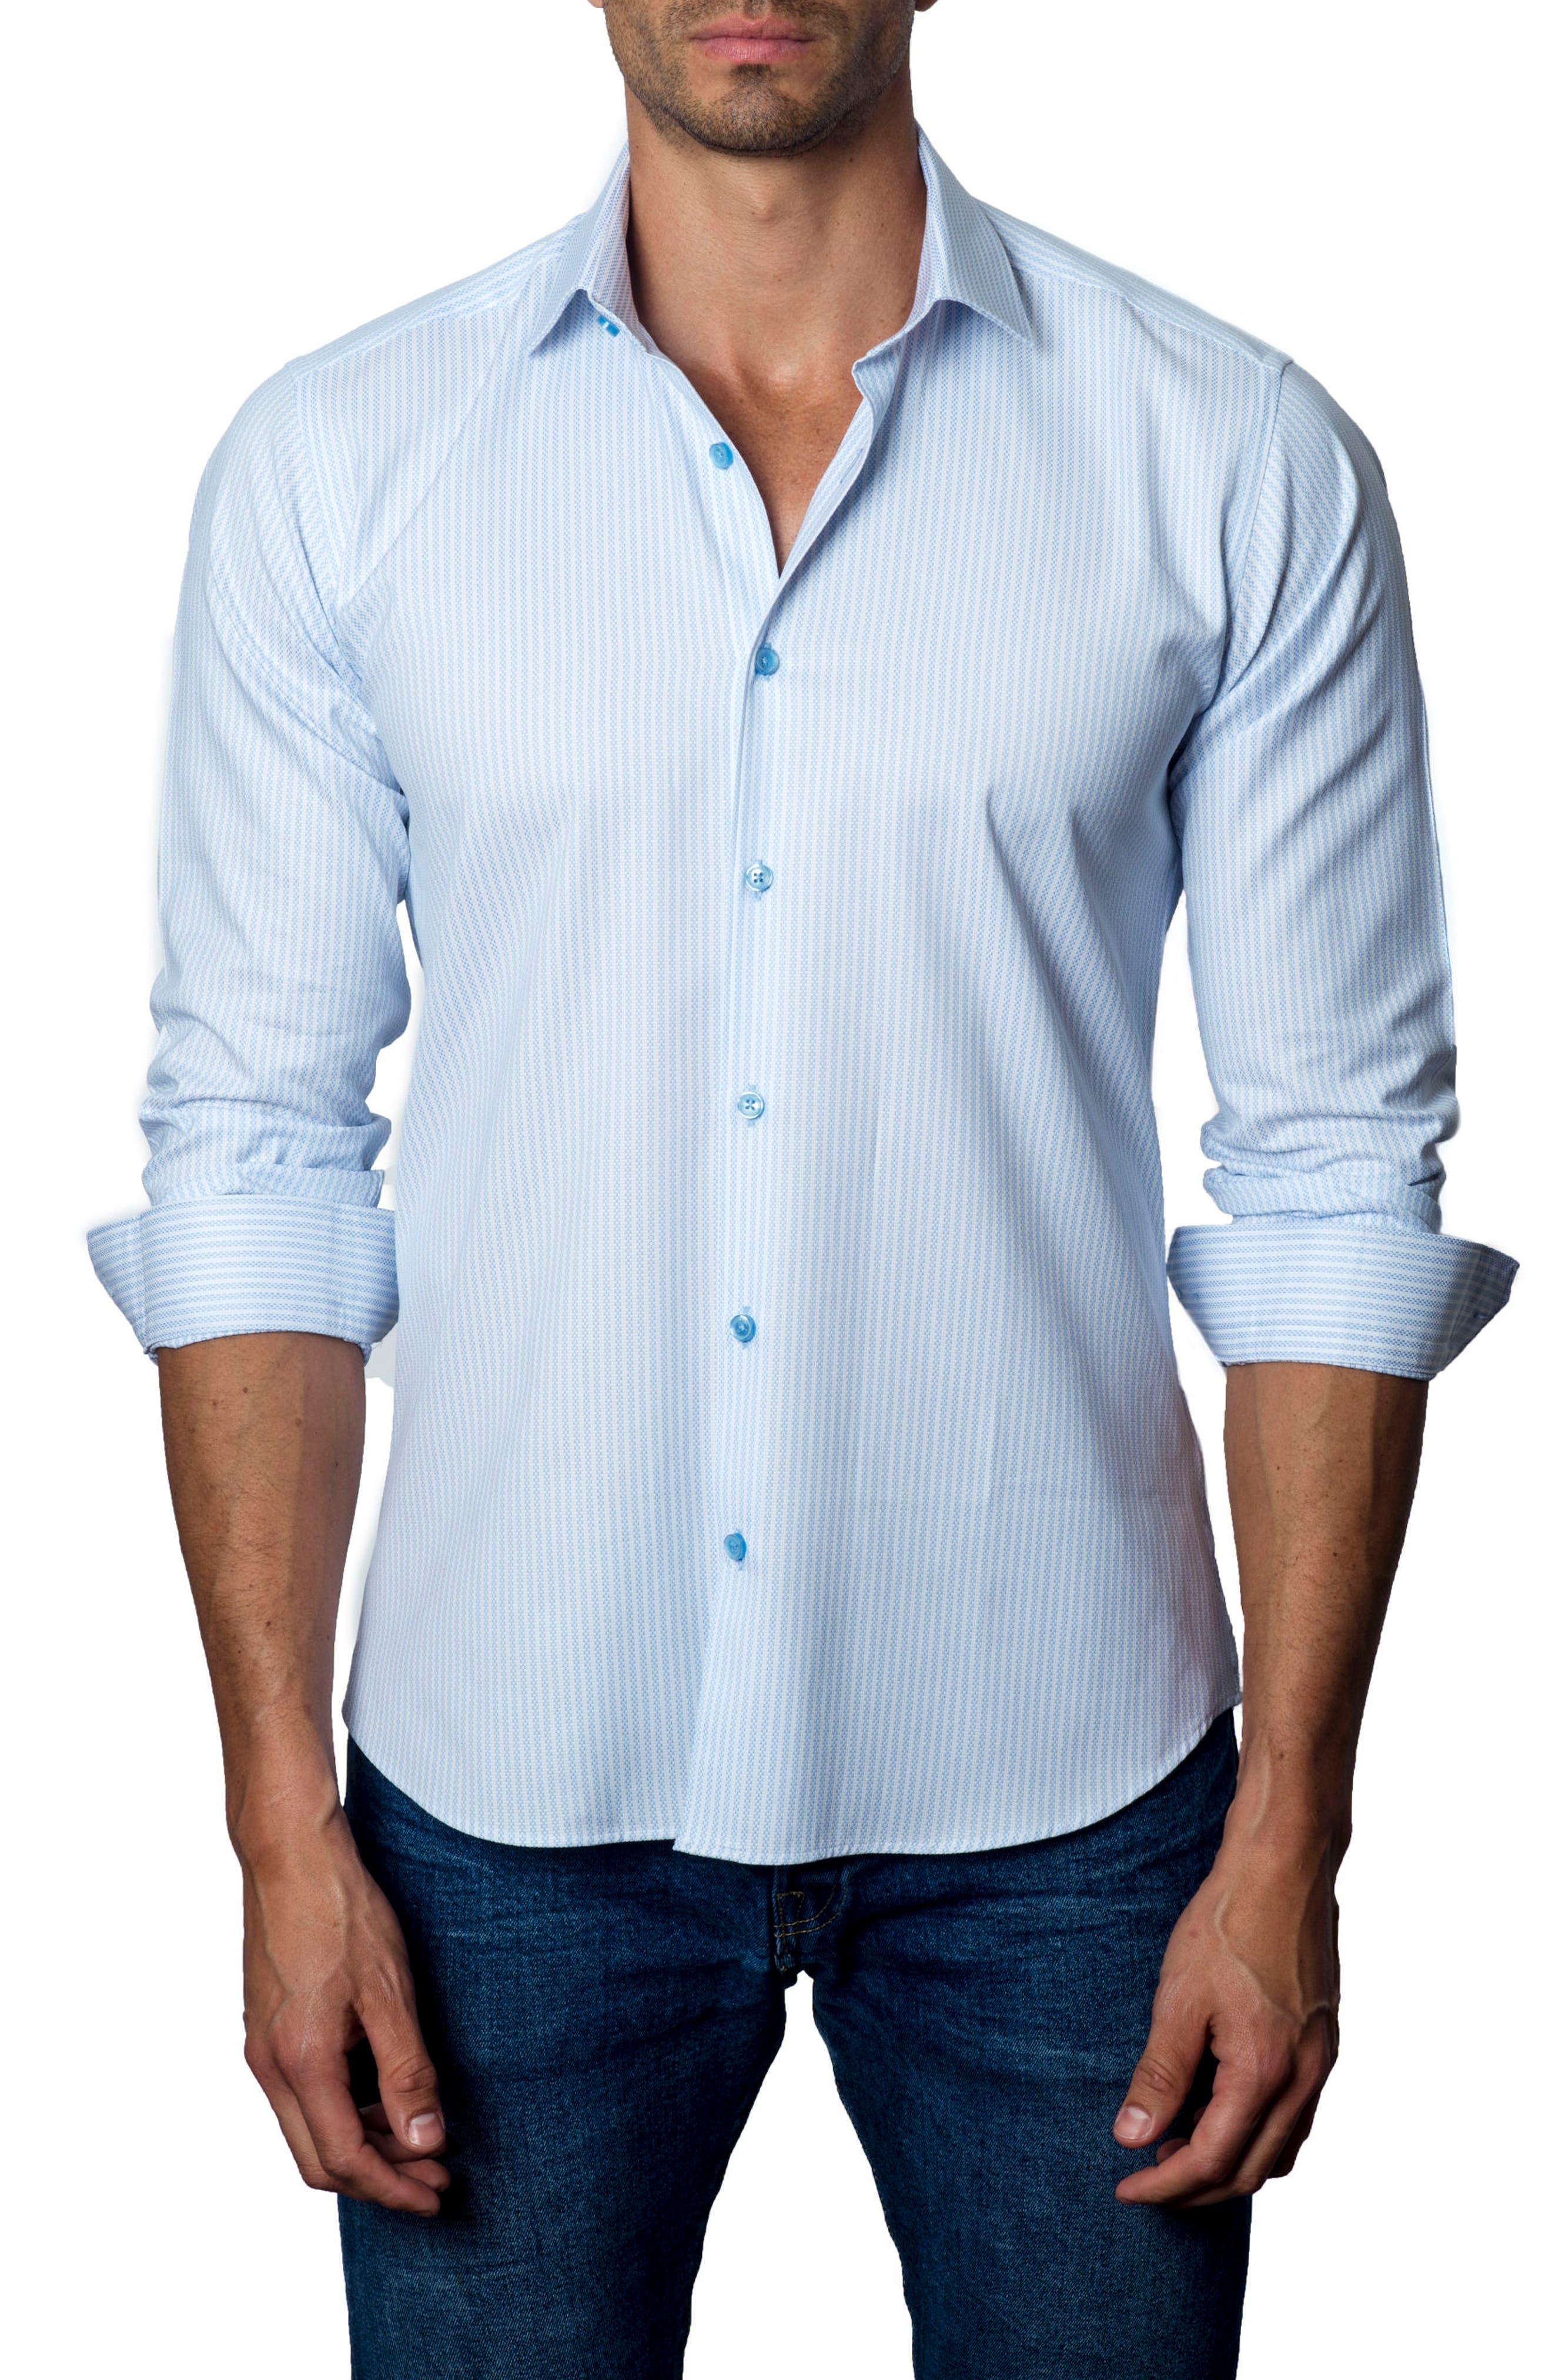 Stripe Sport Shirt,                         Main,                         color, Light Blue / White Print